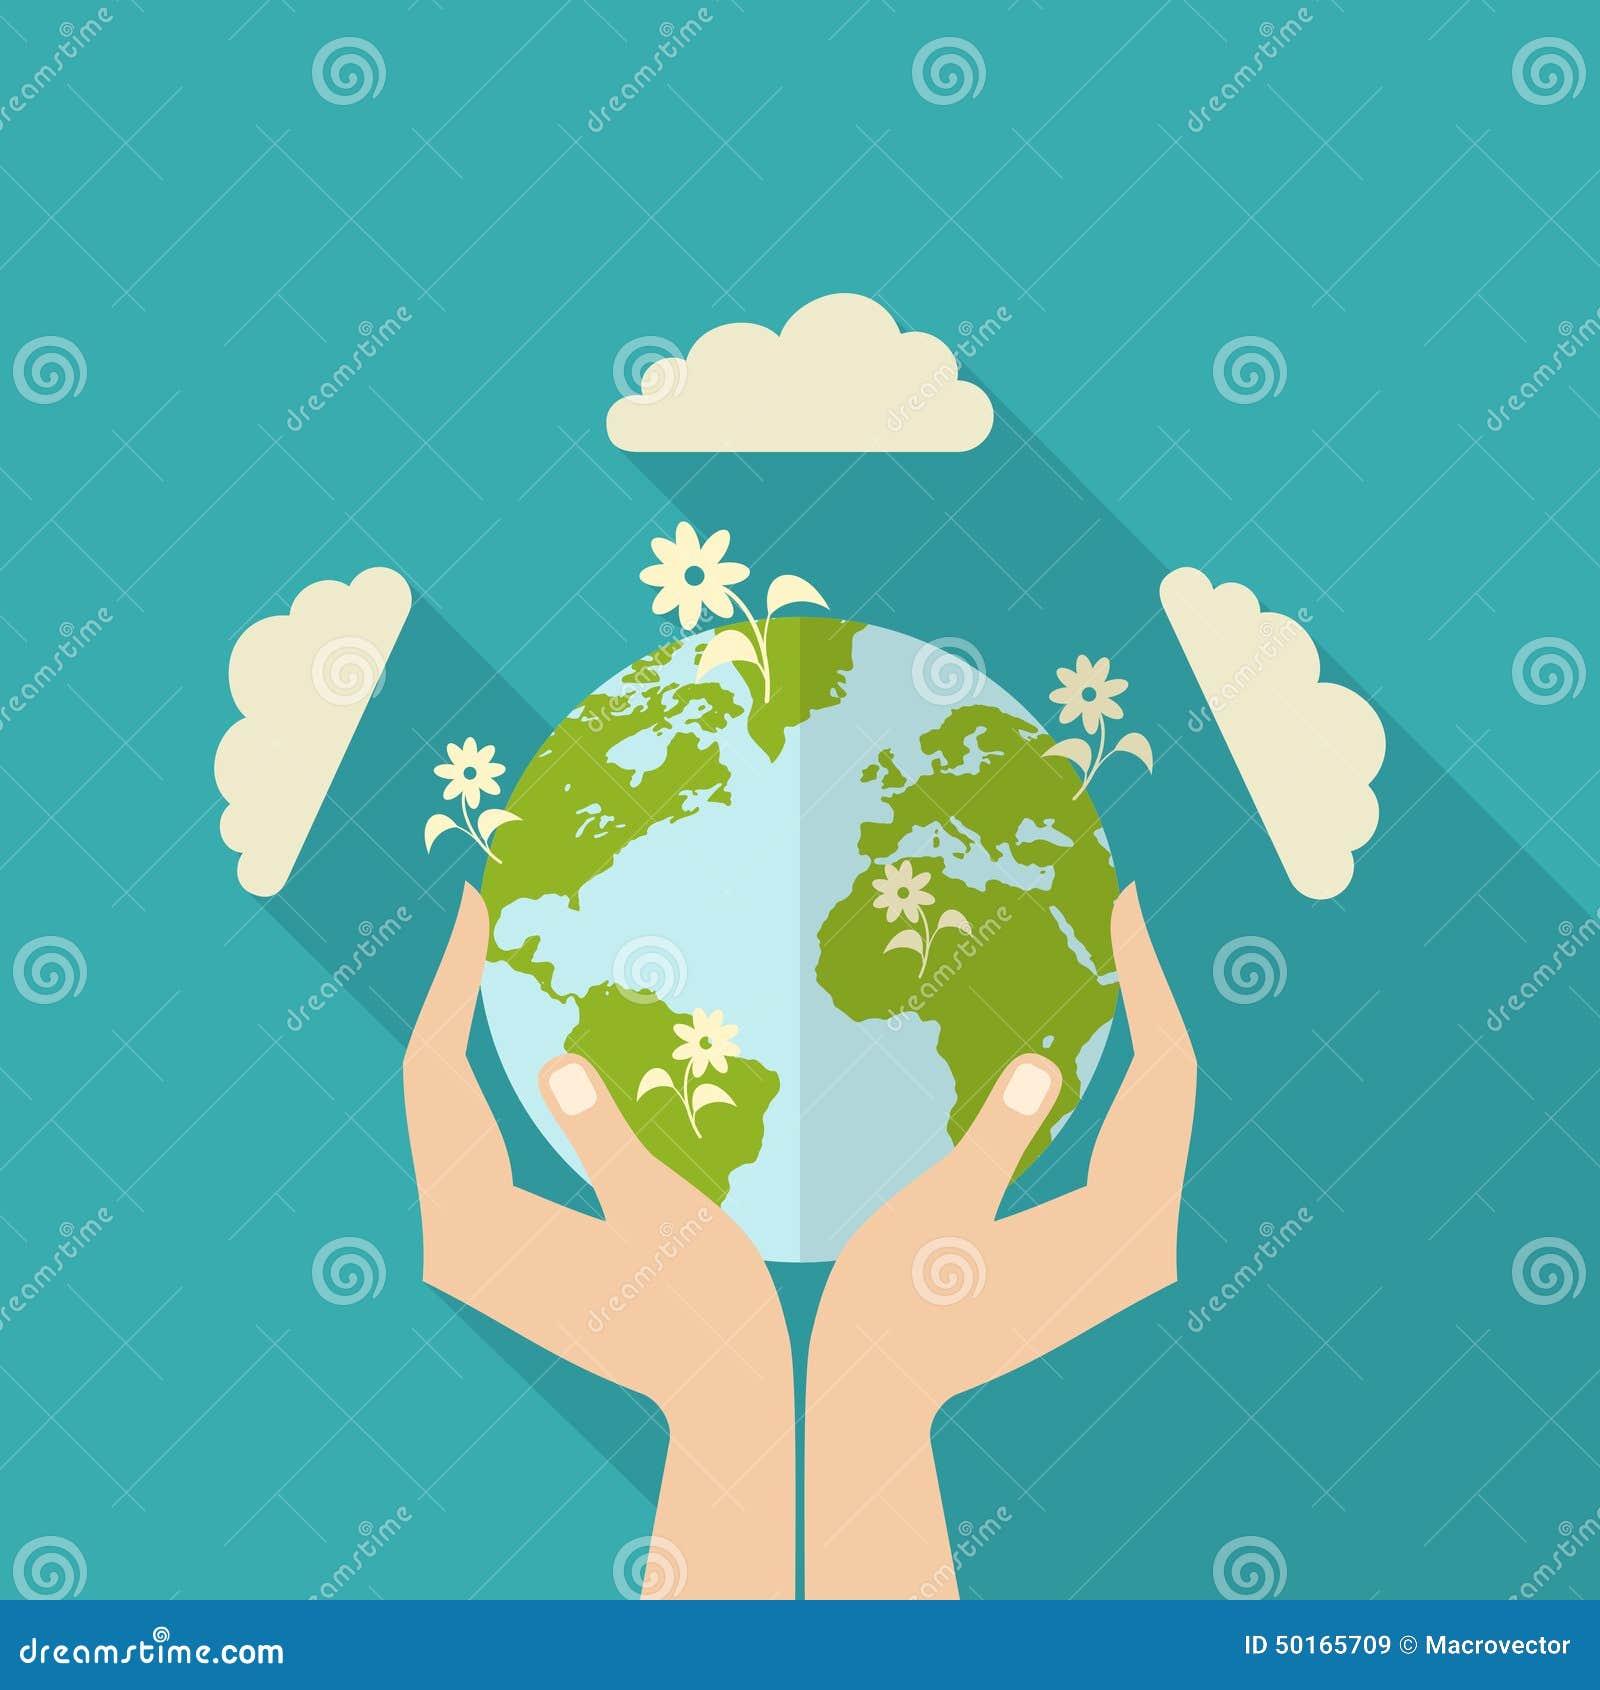 human hands holding globe stock vector